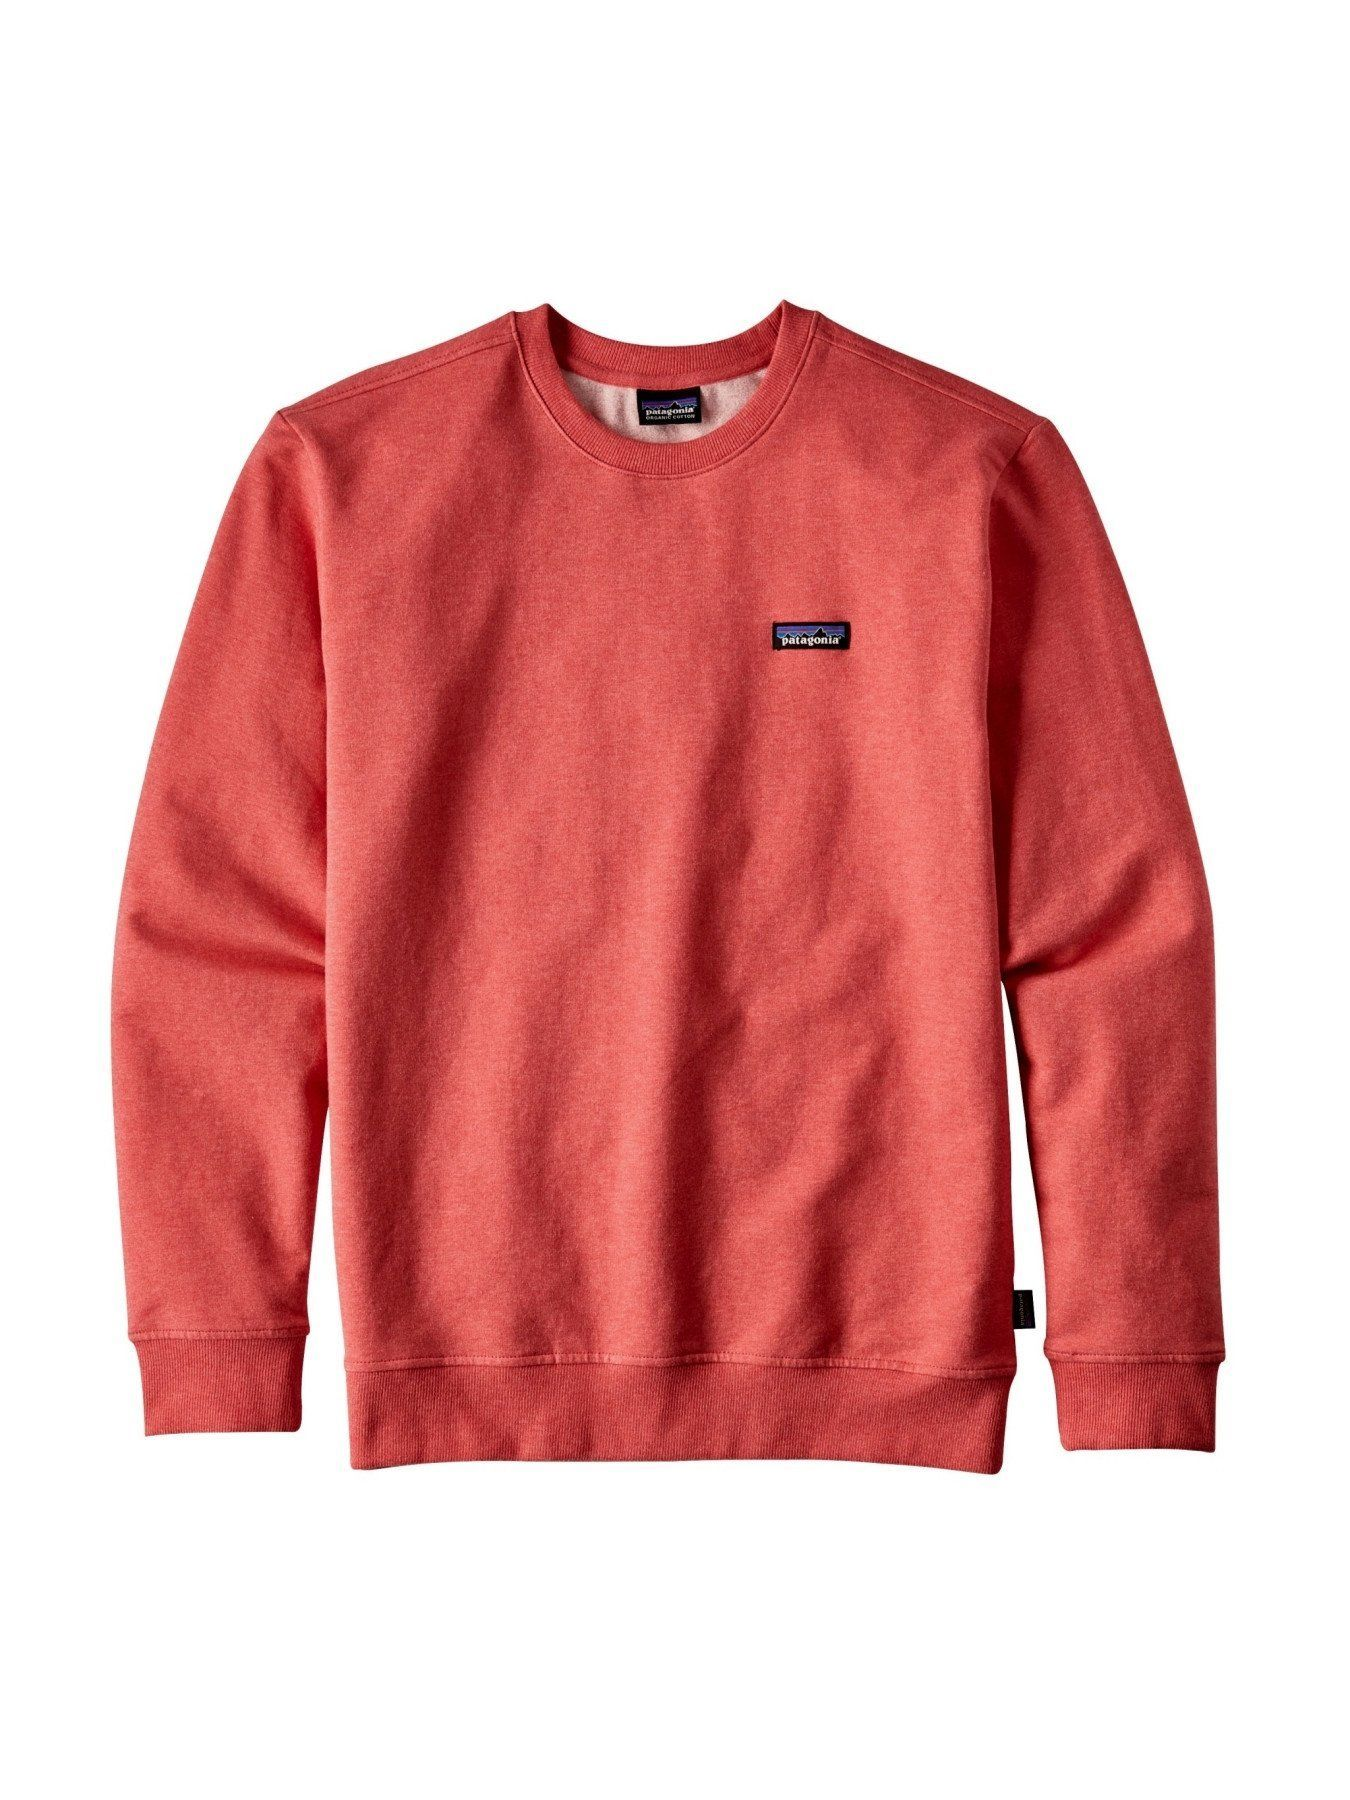 Patagonia Men S P 6 Label Midweight Crew Sweatshirt Custom Corporate Orders Only Minimum Order 10 Units Mens Sweatshirts Hoodie Mens Sweatshirts Sweatshirts [ 1800 x 1350 Pixel ]